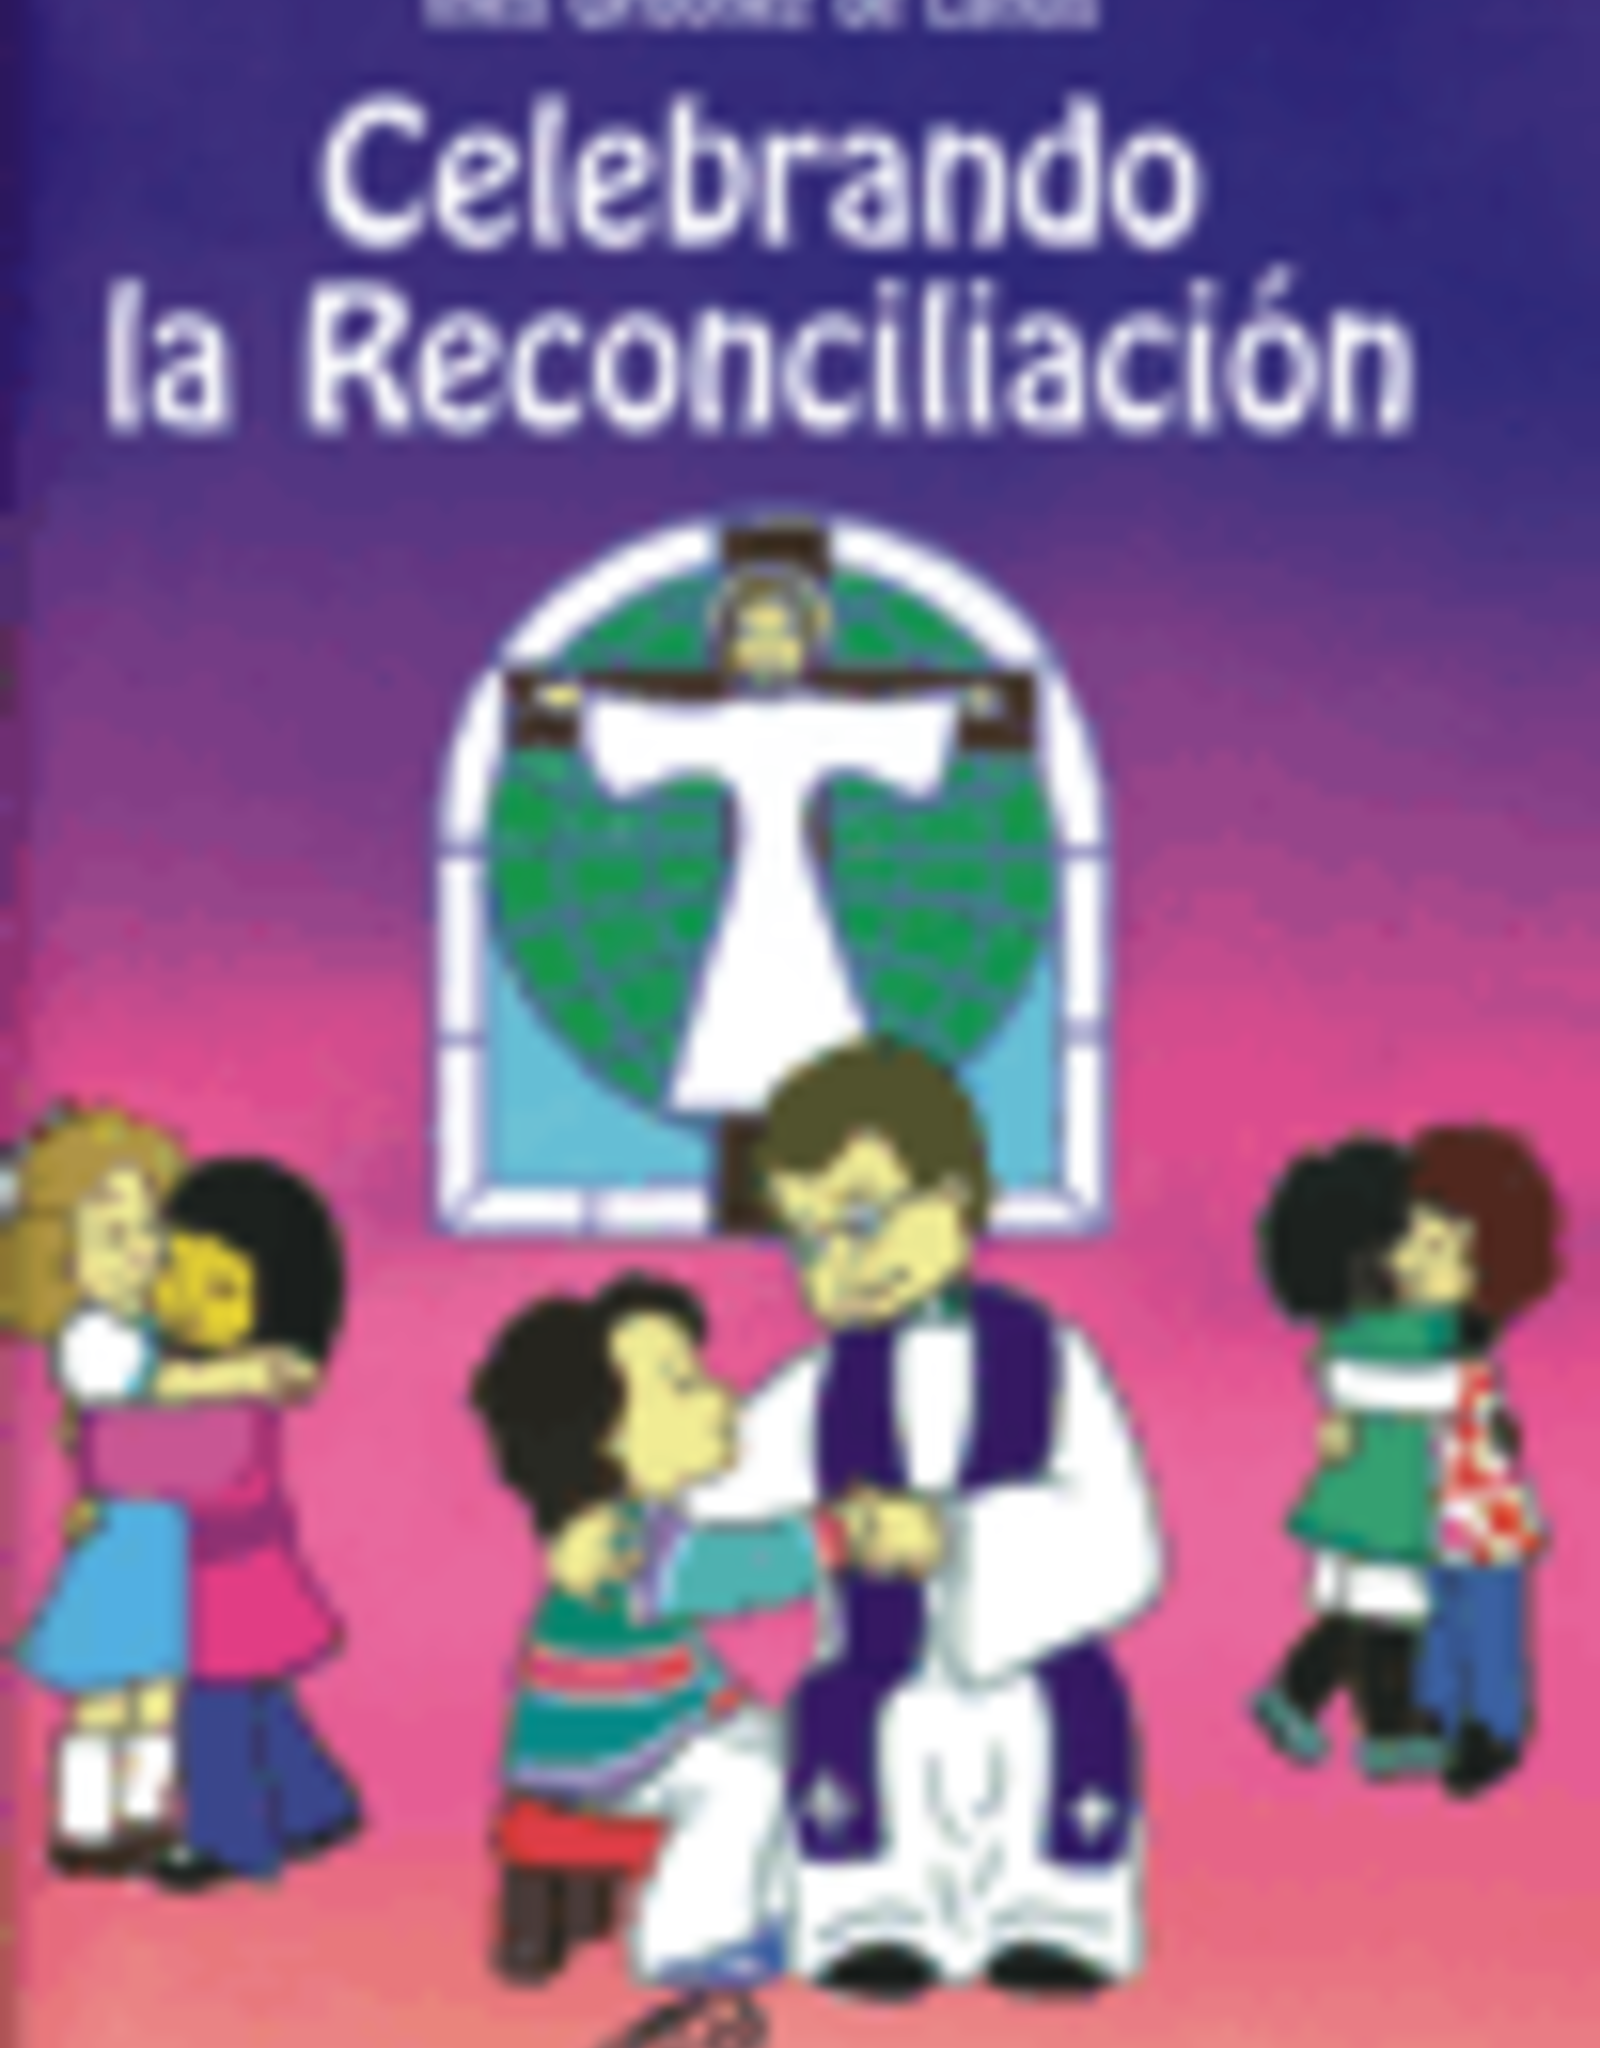 Paulinas Celebrando la ReconciliaciÌ_n, InÌ©s OrdÌ_̱ez de Lan̼s